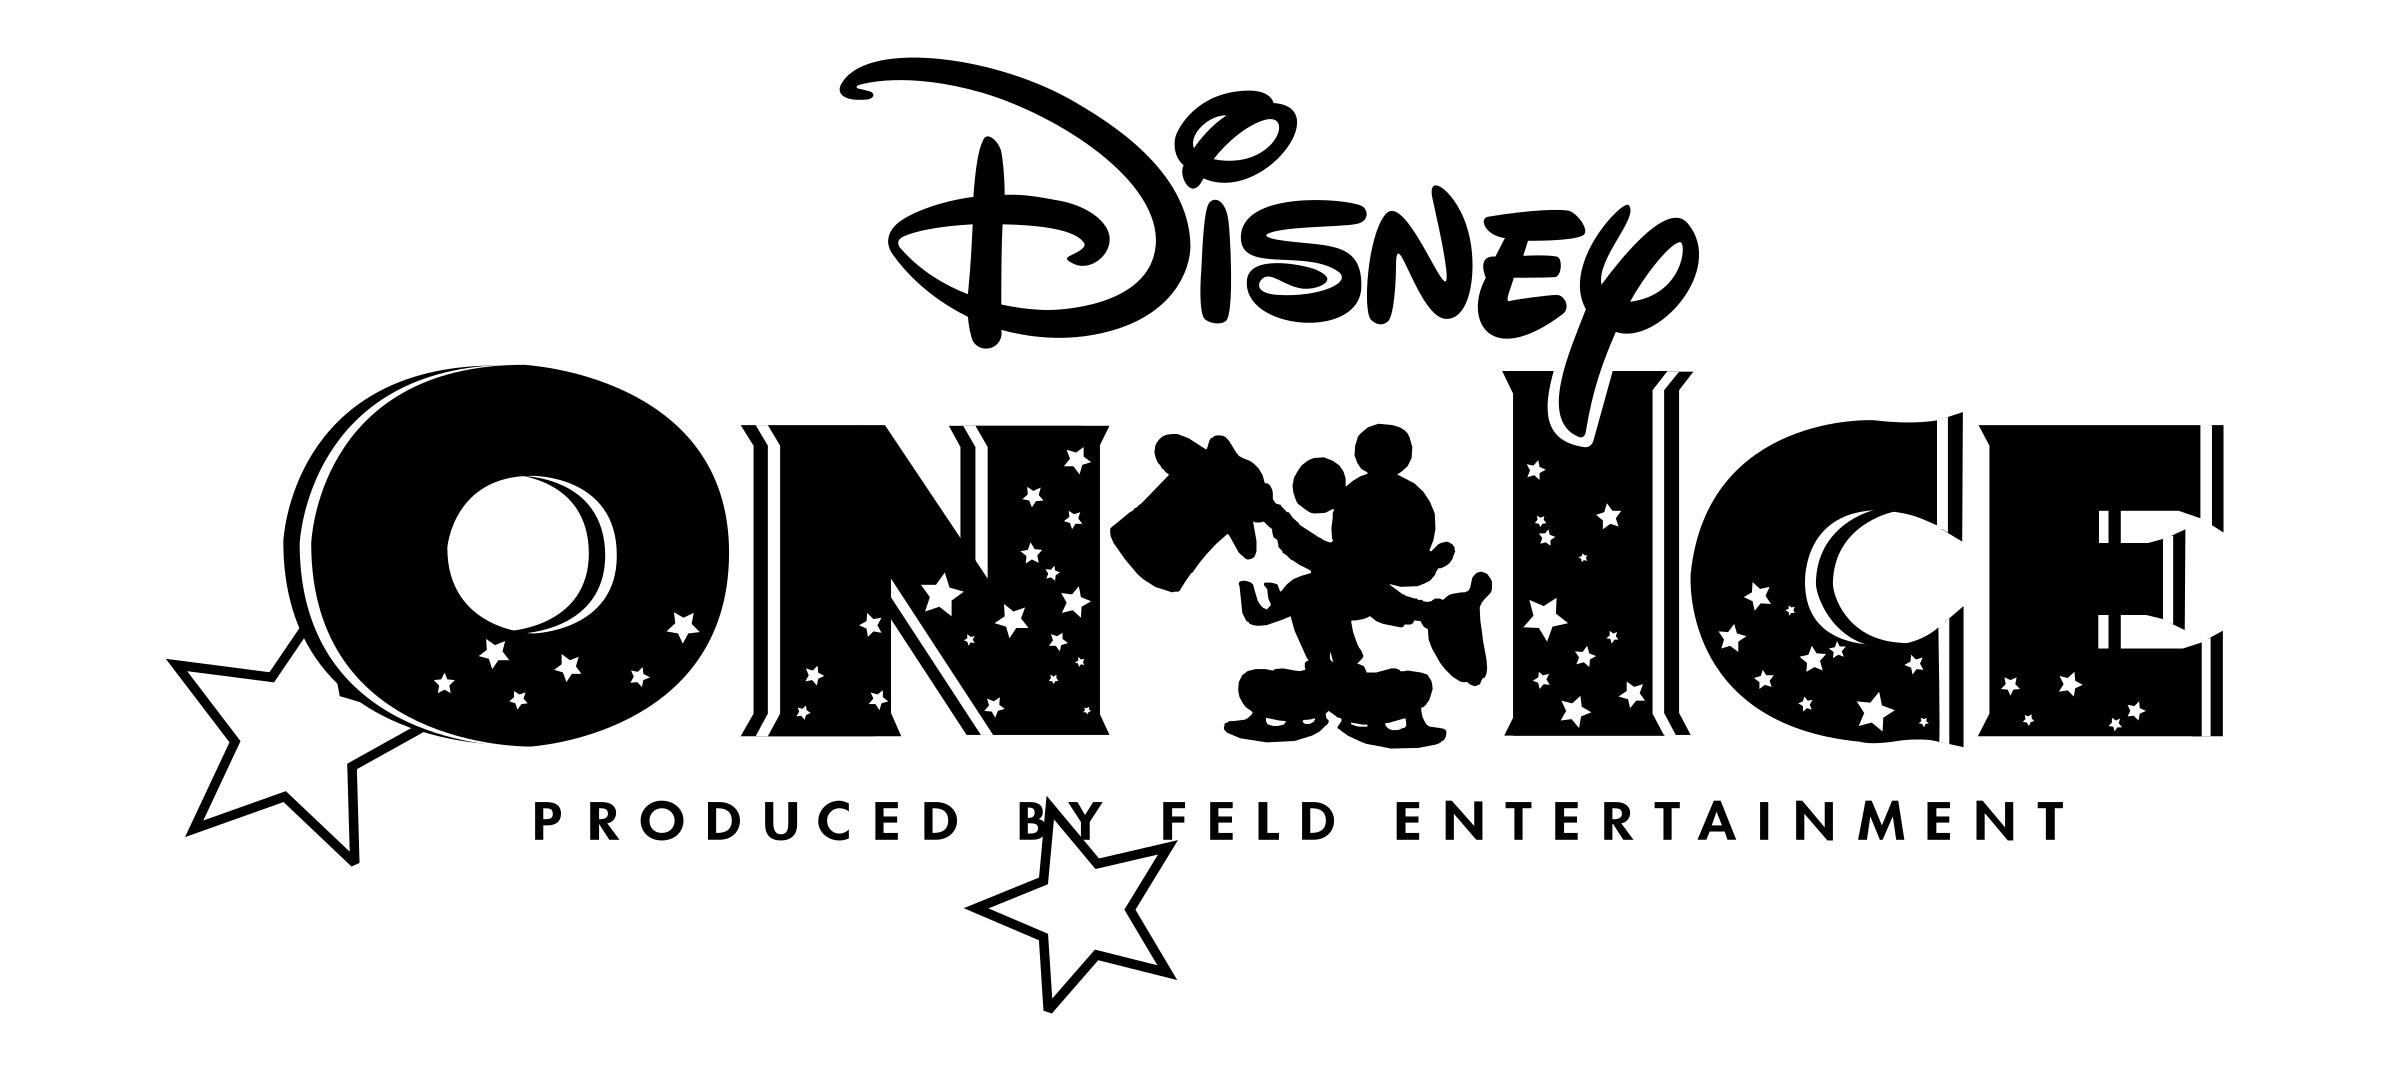 disney-on-ice-logo-png-transparent.png